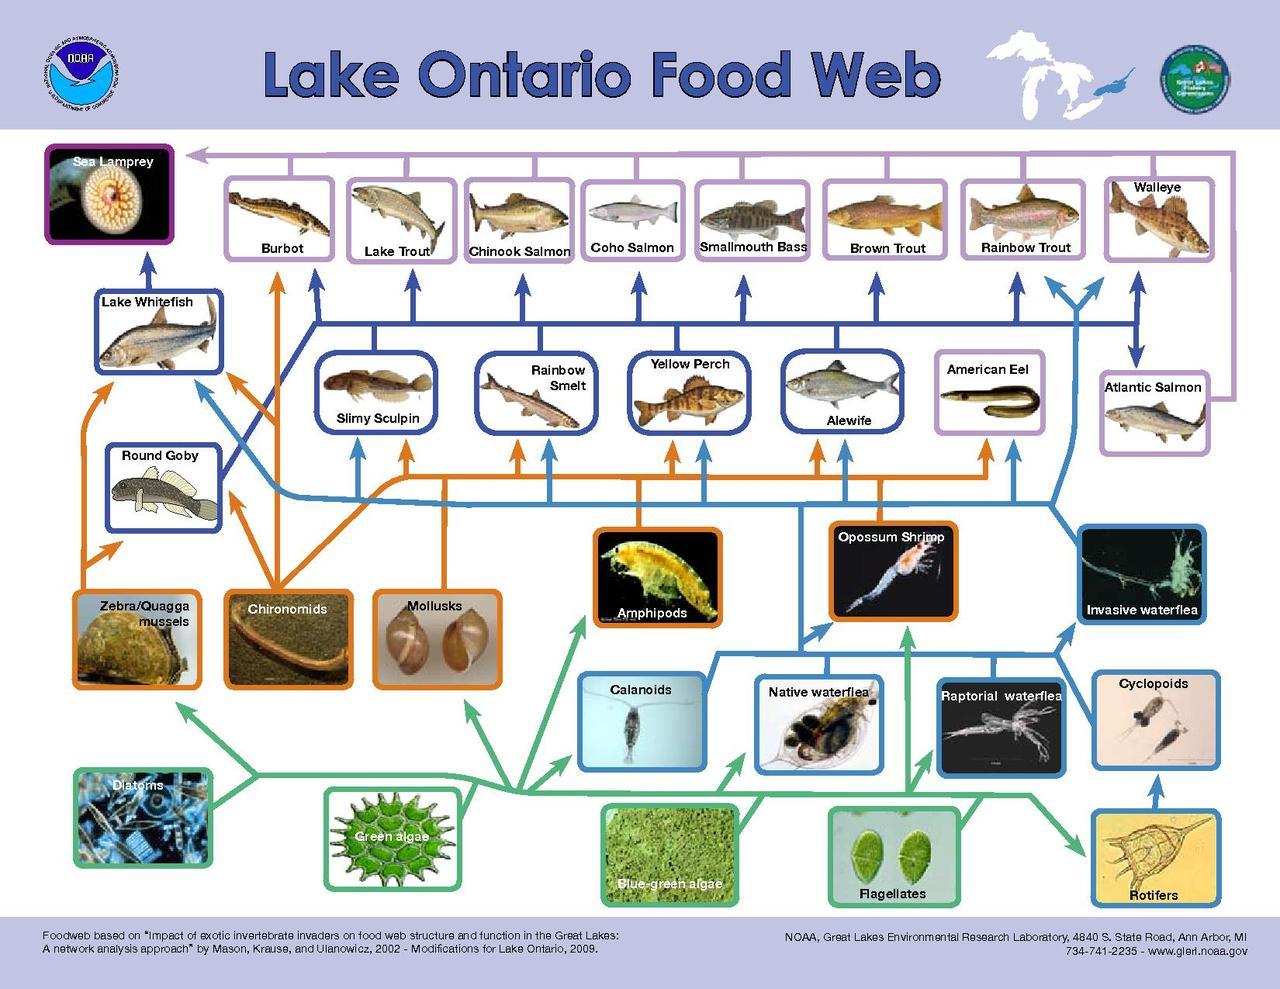 File:Lake Ontario food web.pdf - Wikimedia Commons